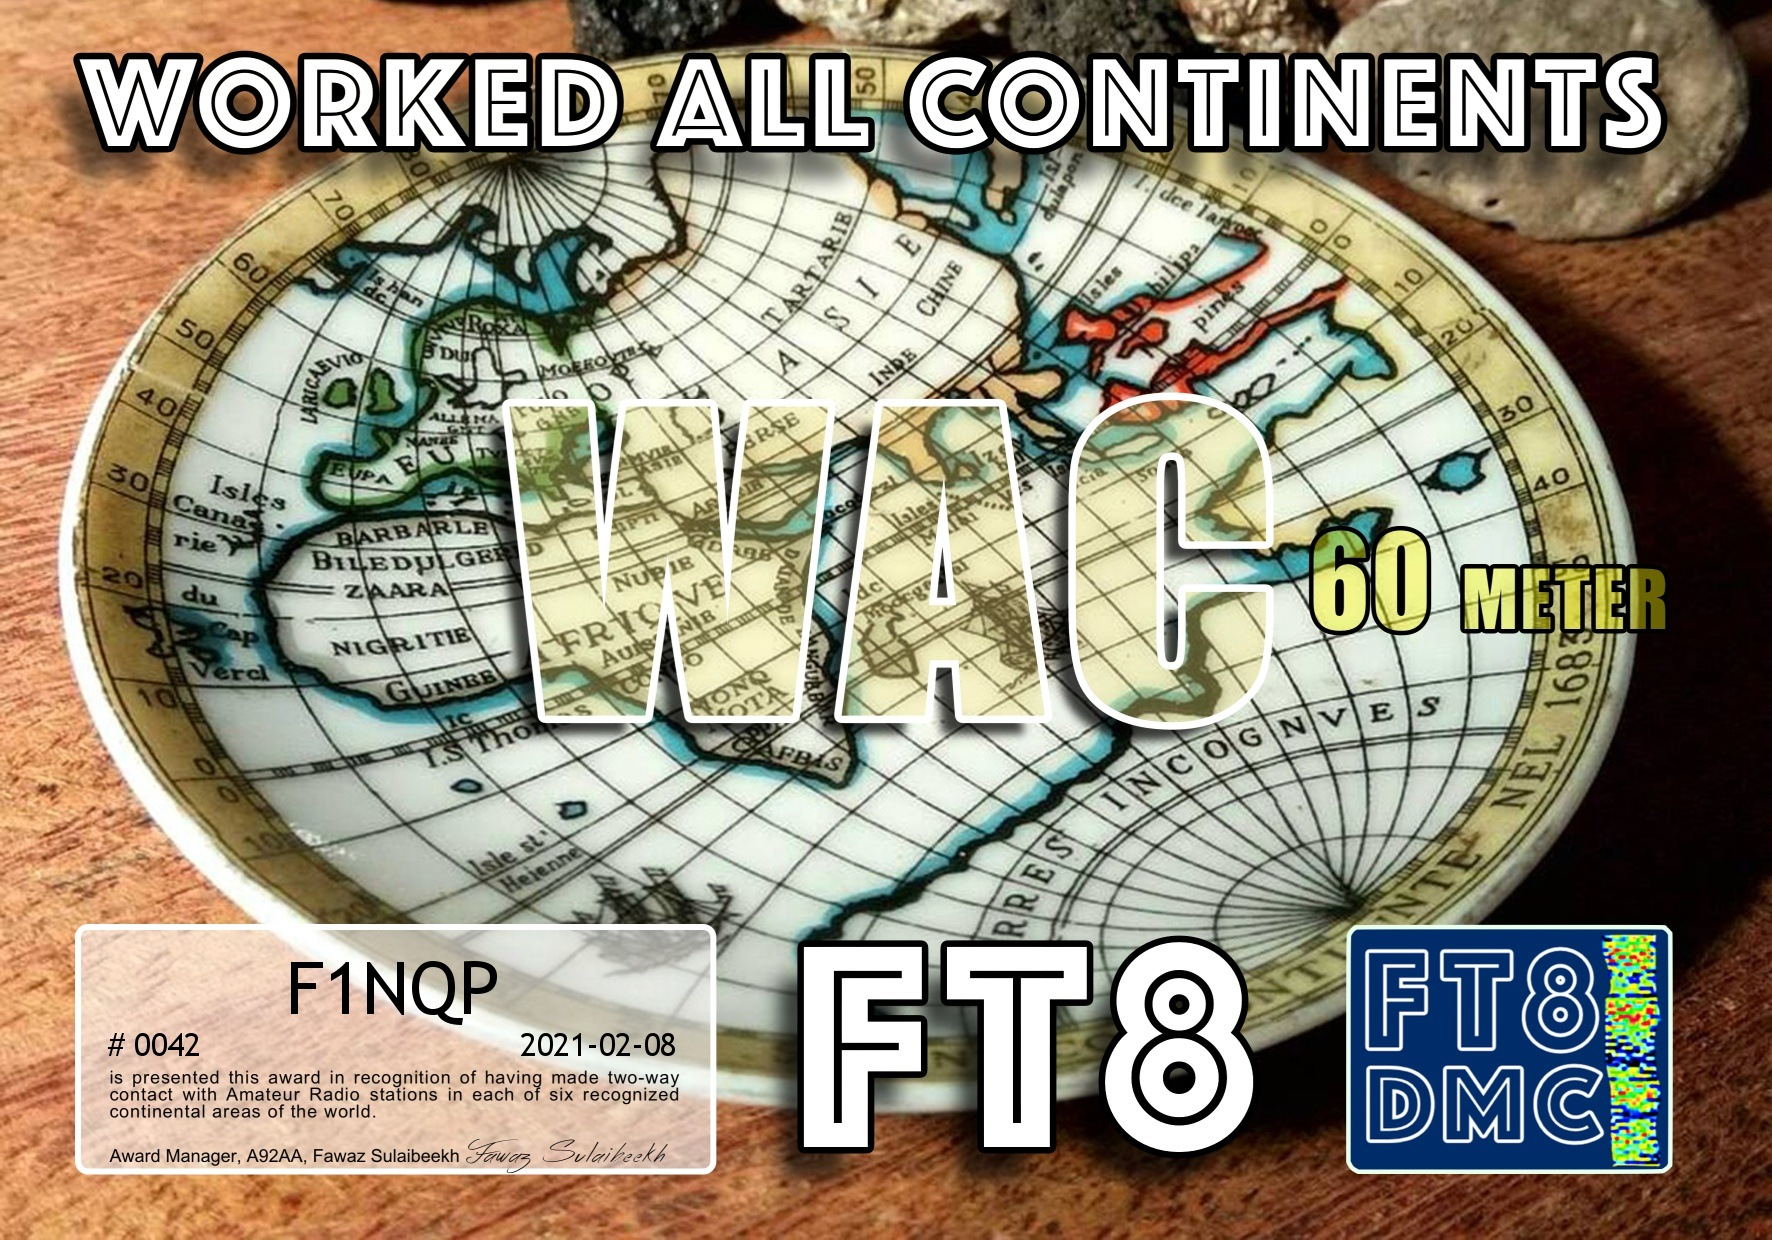 F1NQP-WAC-60M_FT8DMC.jpg